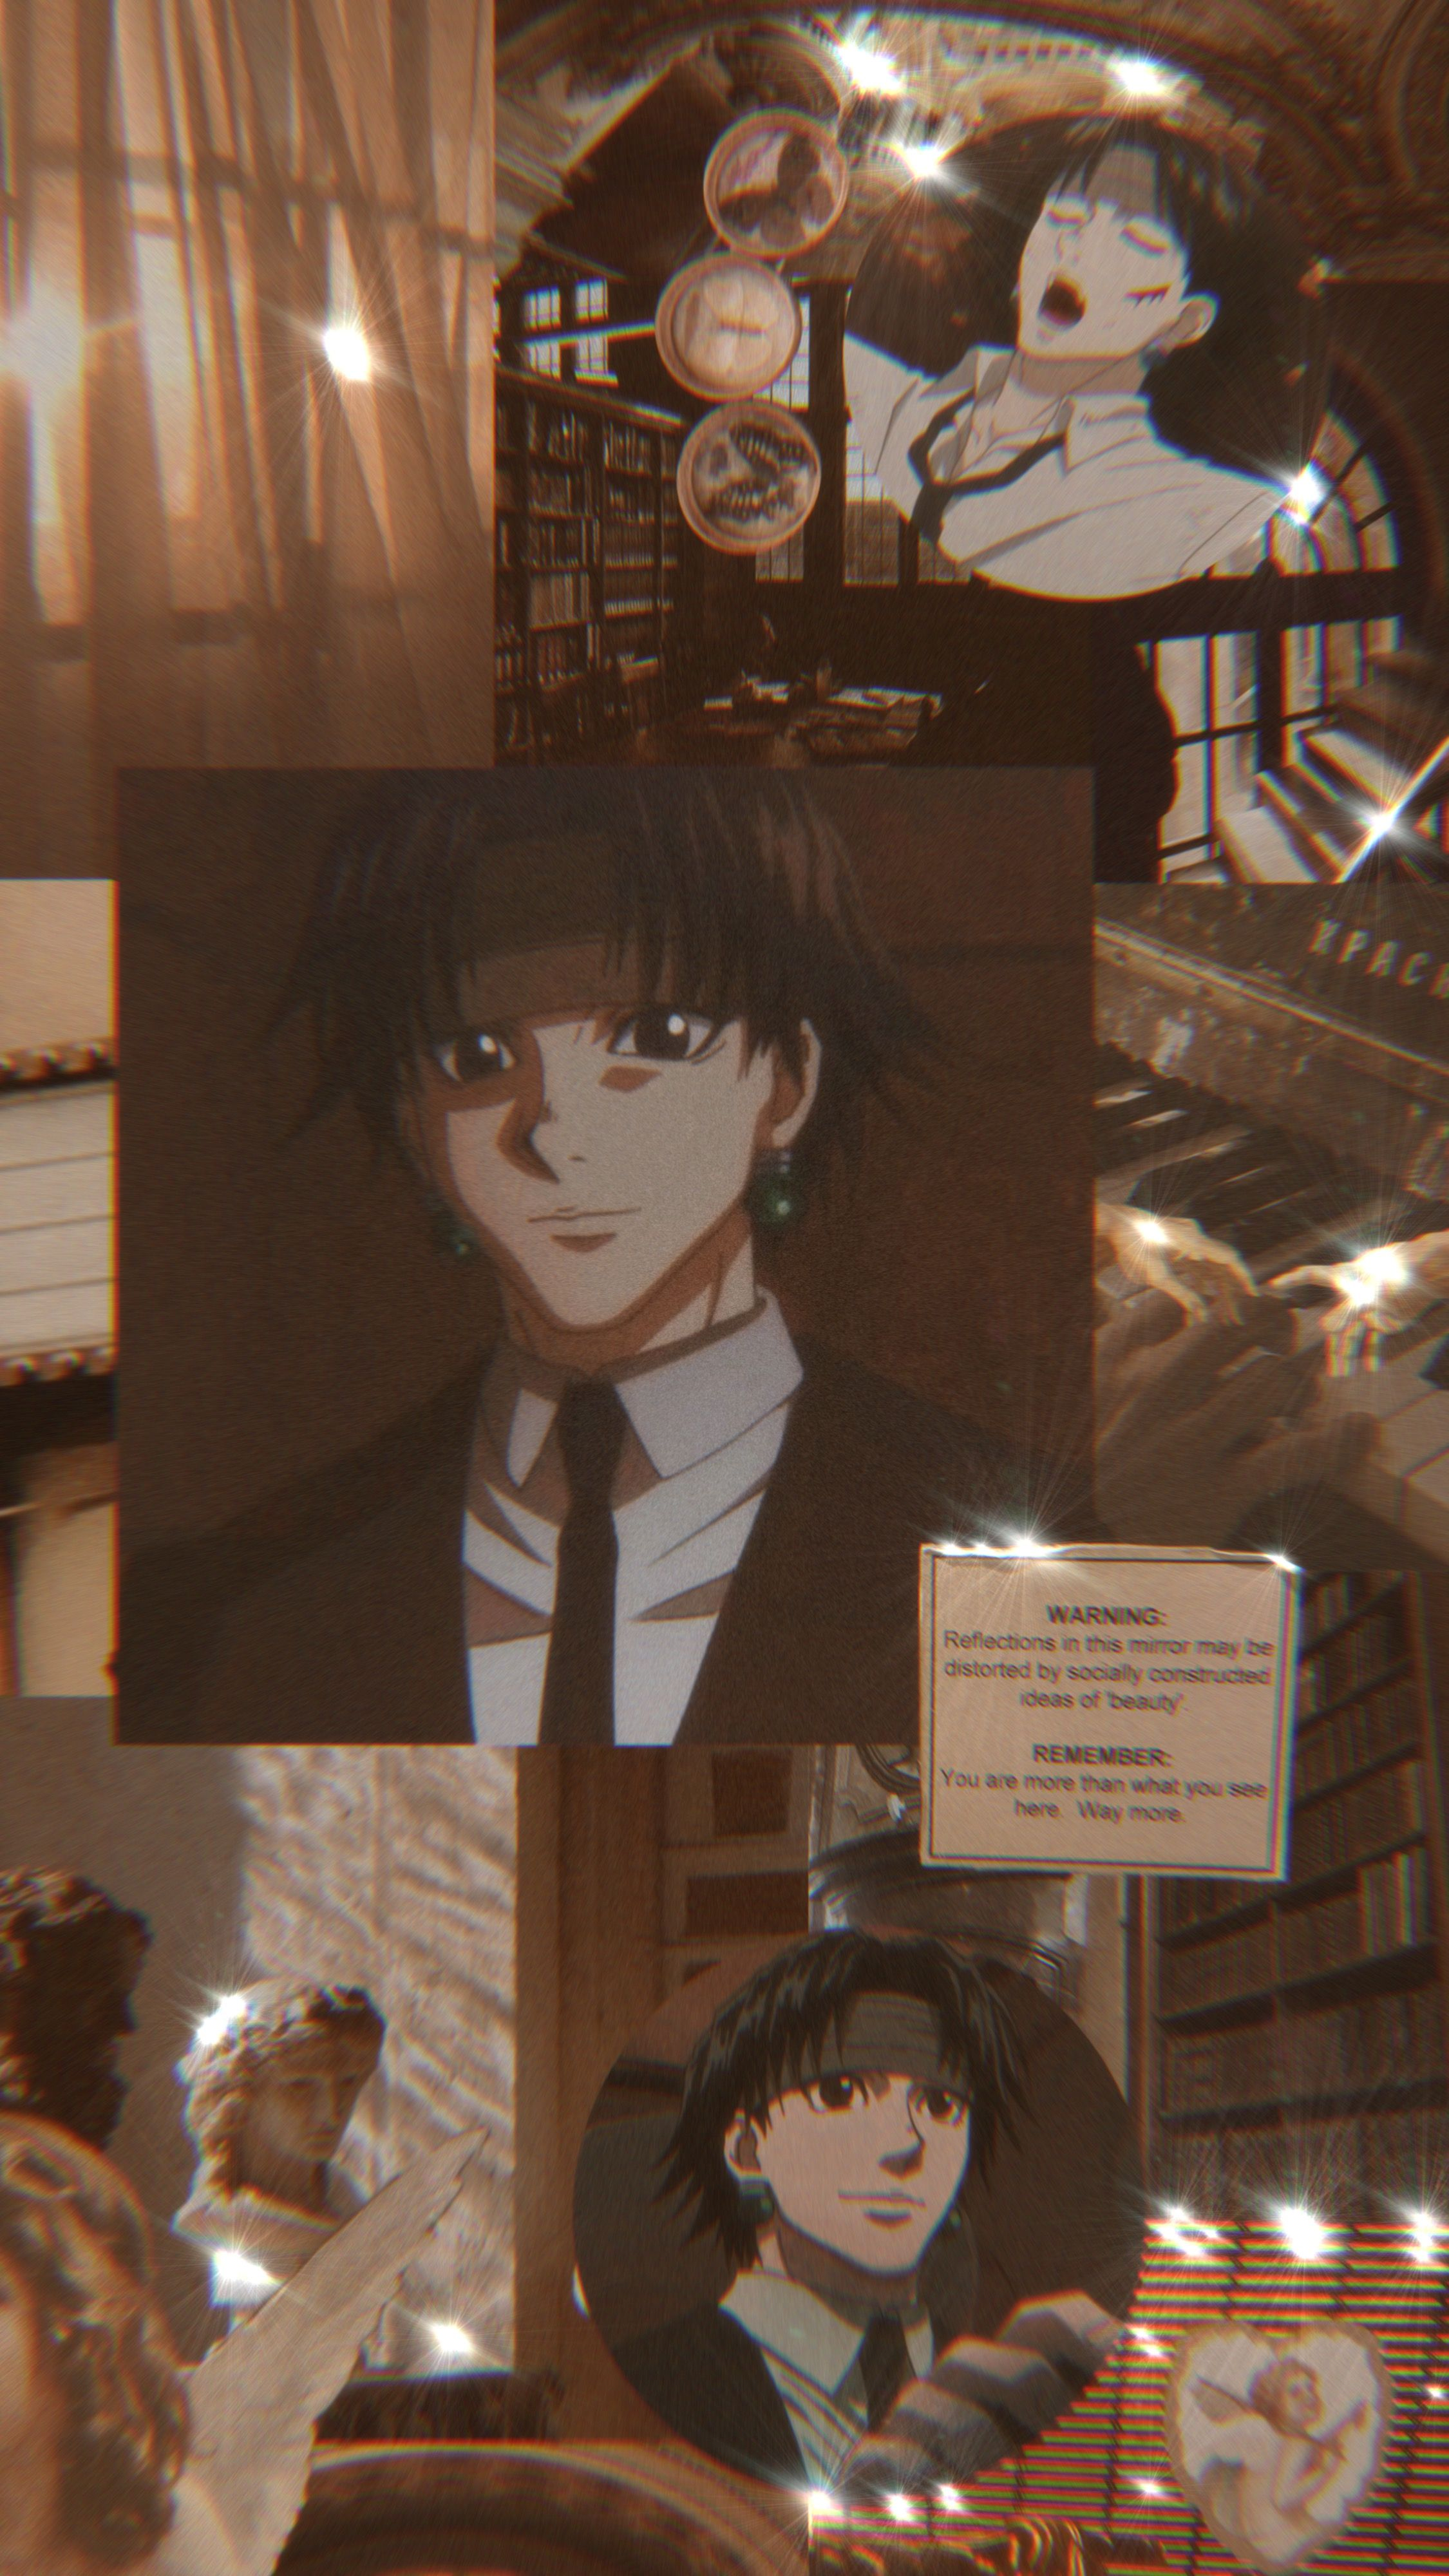 Hunter x hunter live wallpaper. Hunter X Hunter Chrollo Wallpaper | Anime wallpaper iphone ...